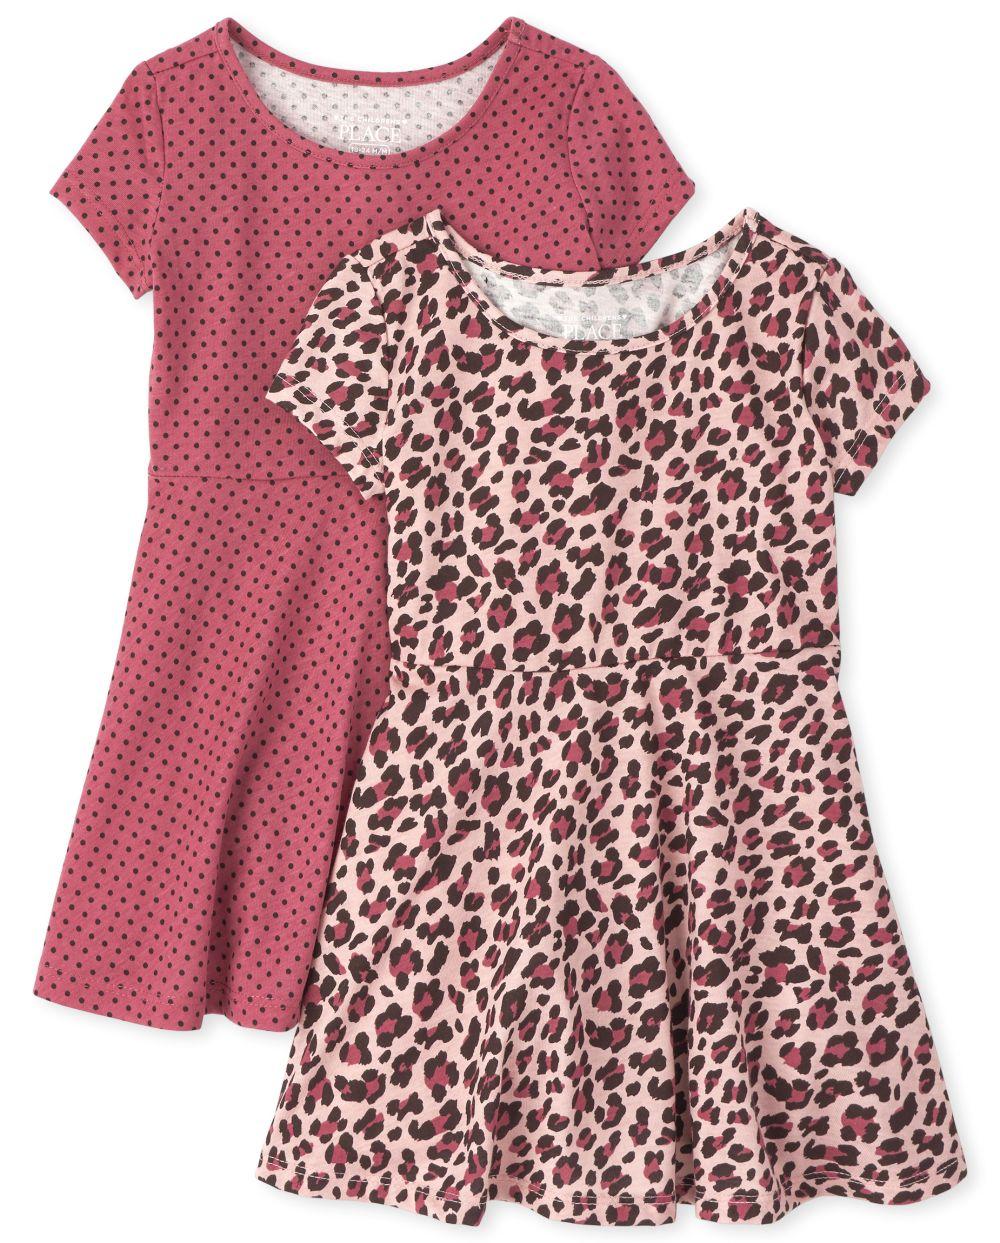 Baby And Toddler Girls Leopard Skater Dress 2-Pack